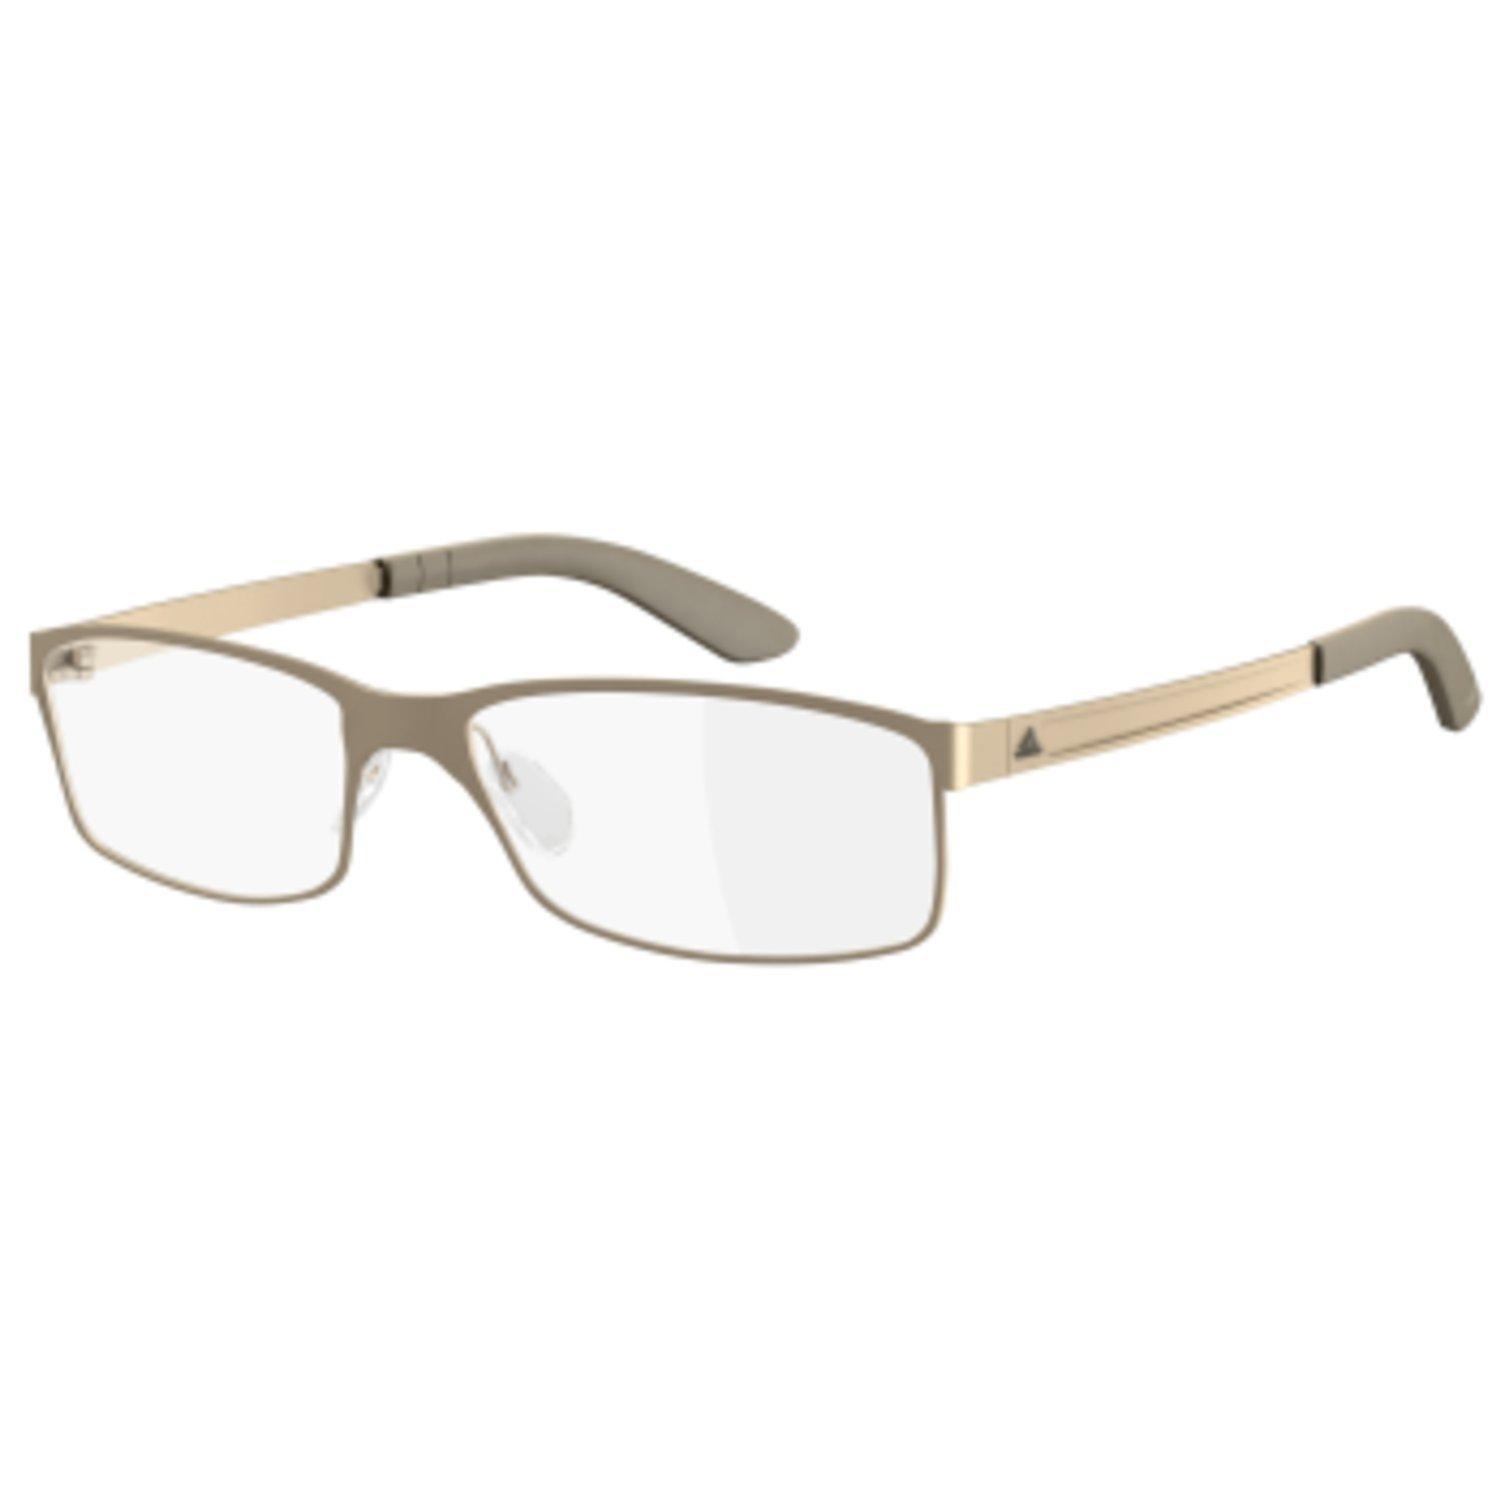 New Adidas Prescription Eyeglasses - AF51 6064 - Matte Cream (54-17-135)